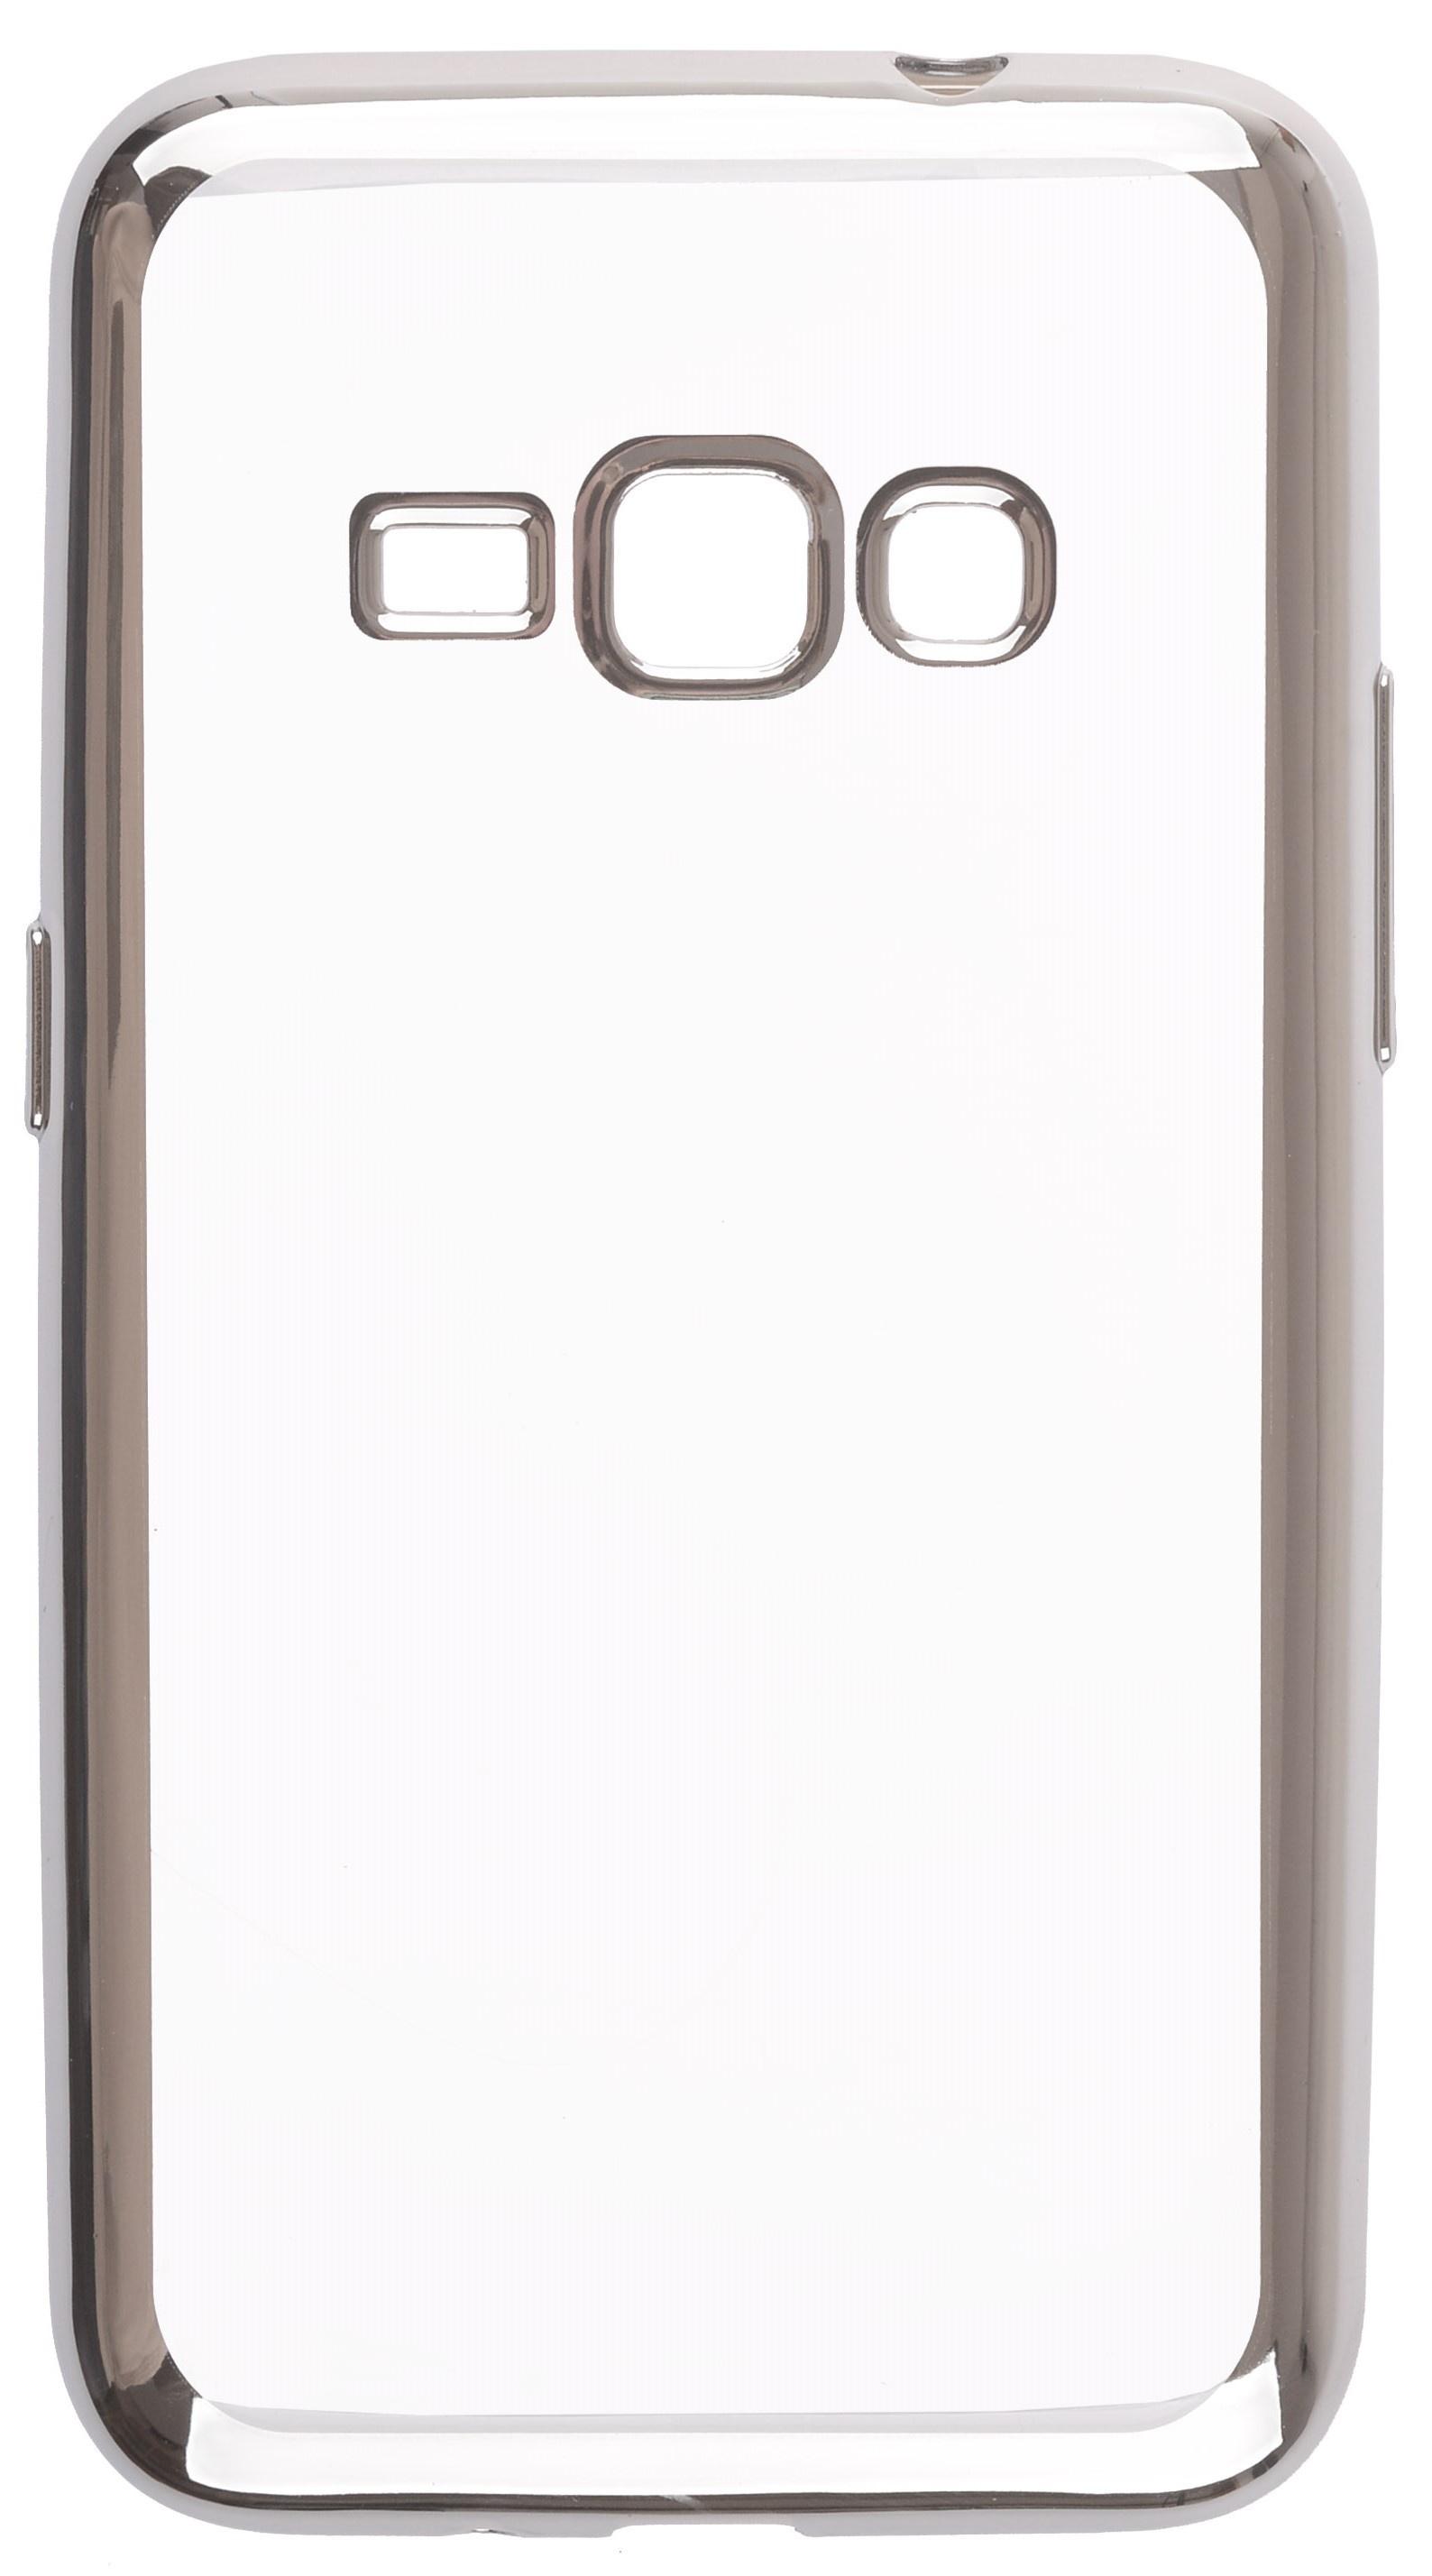 Чехол для сотового телефона skinBOX Silicone chrome border, 4630042524699, серебристый чехол для сотового телефона skinbox silicone chrome border 4630042524514 серебристый